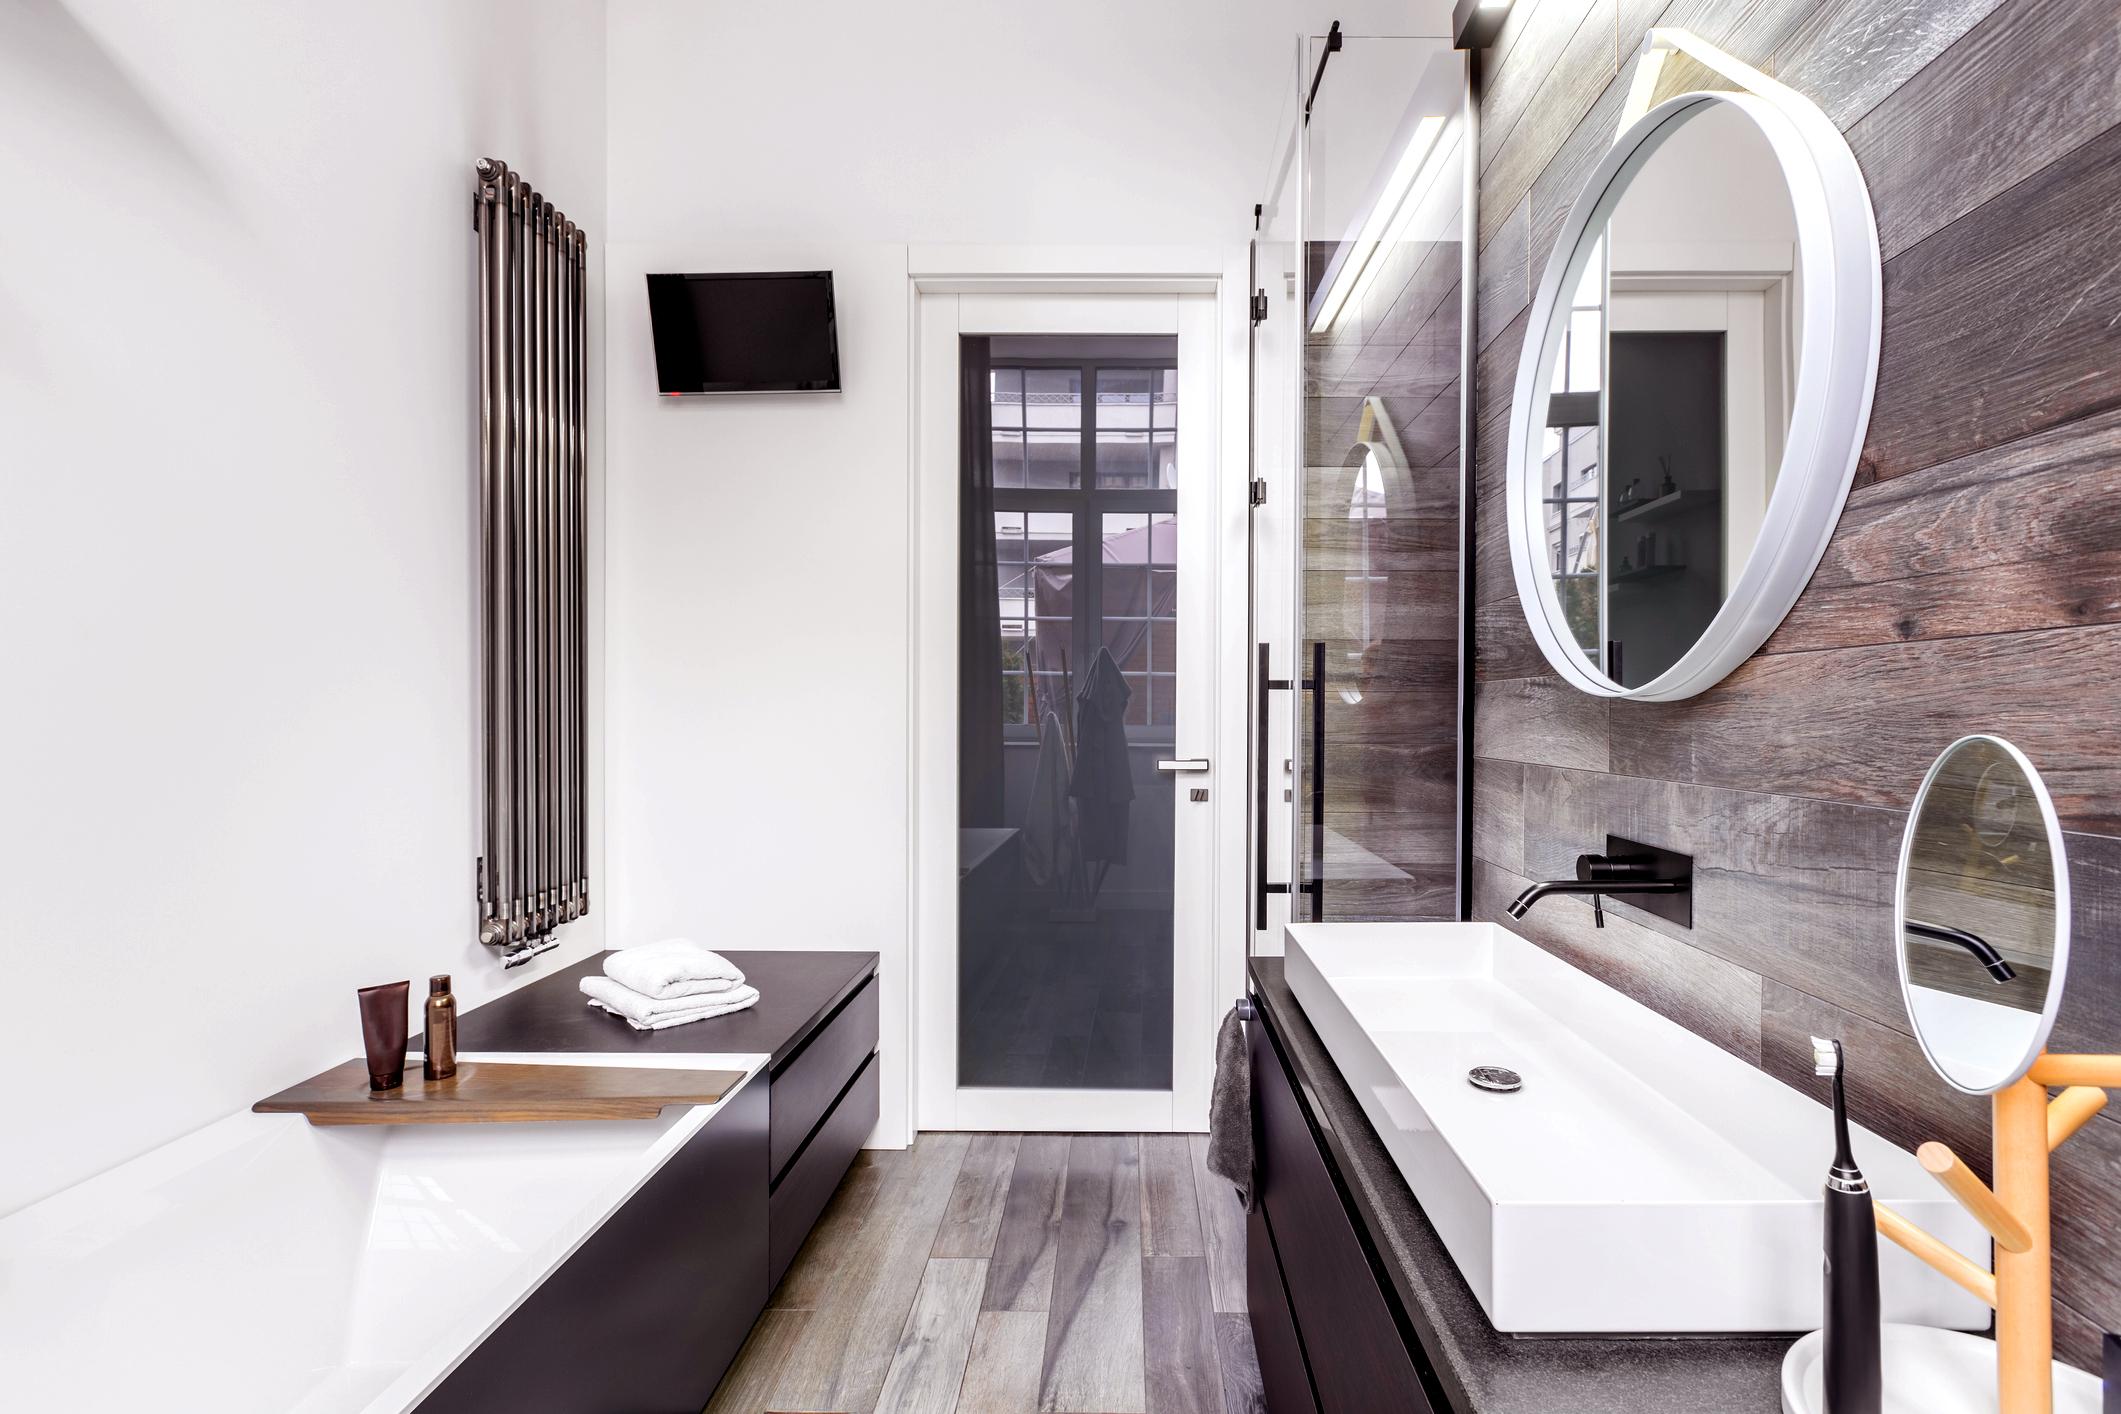 Small Bathroom Design Ideas | LoveToKnow